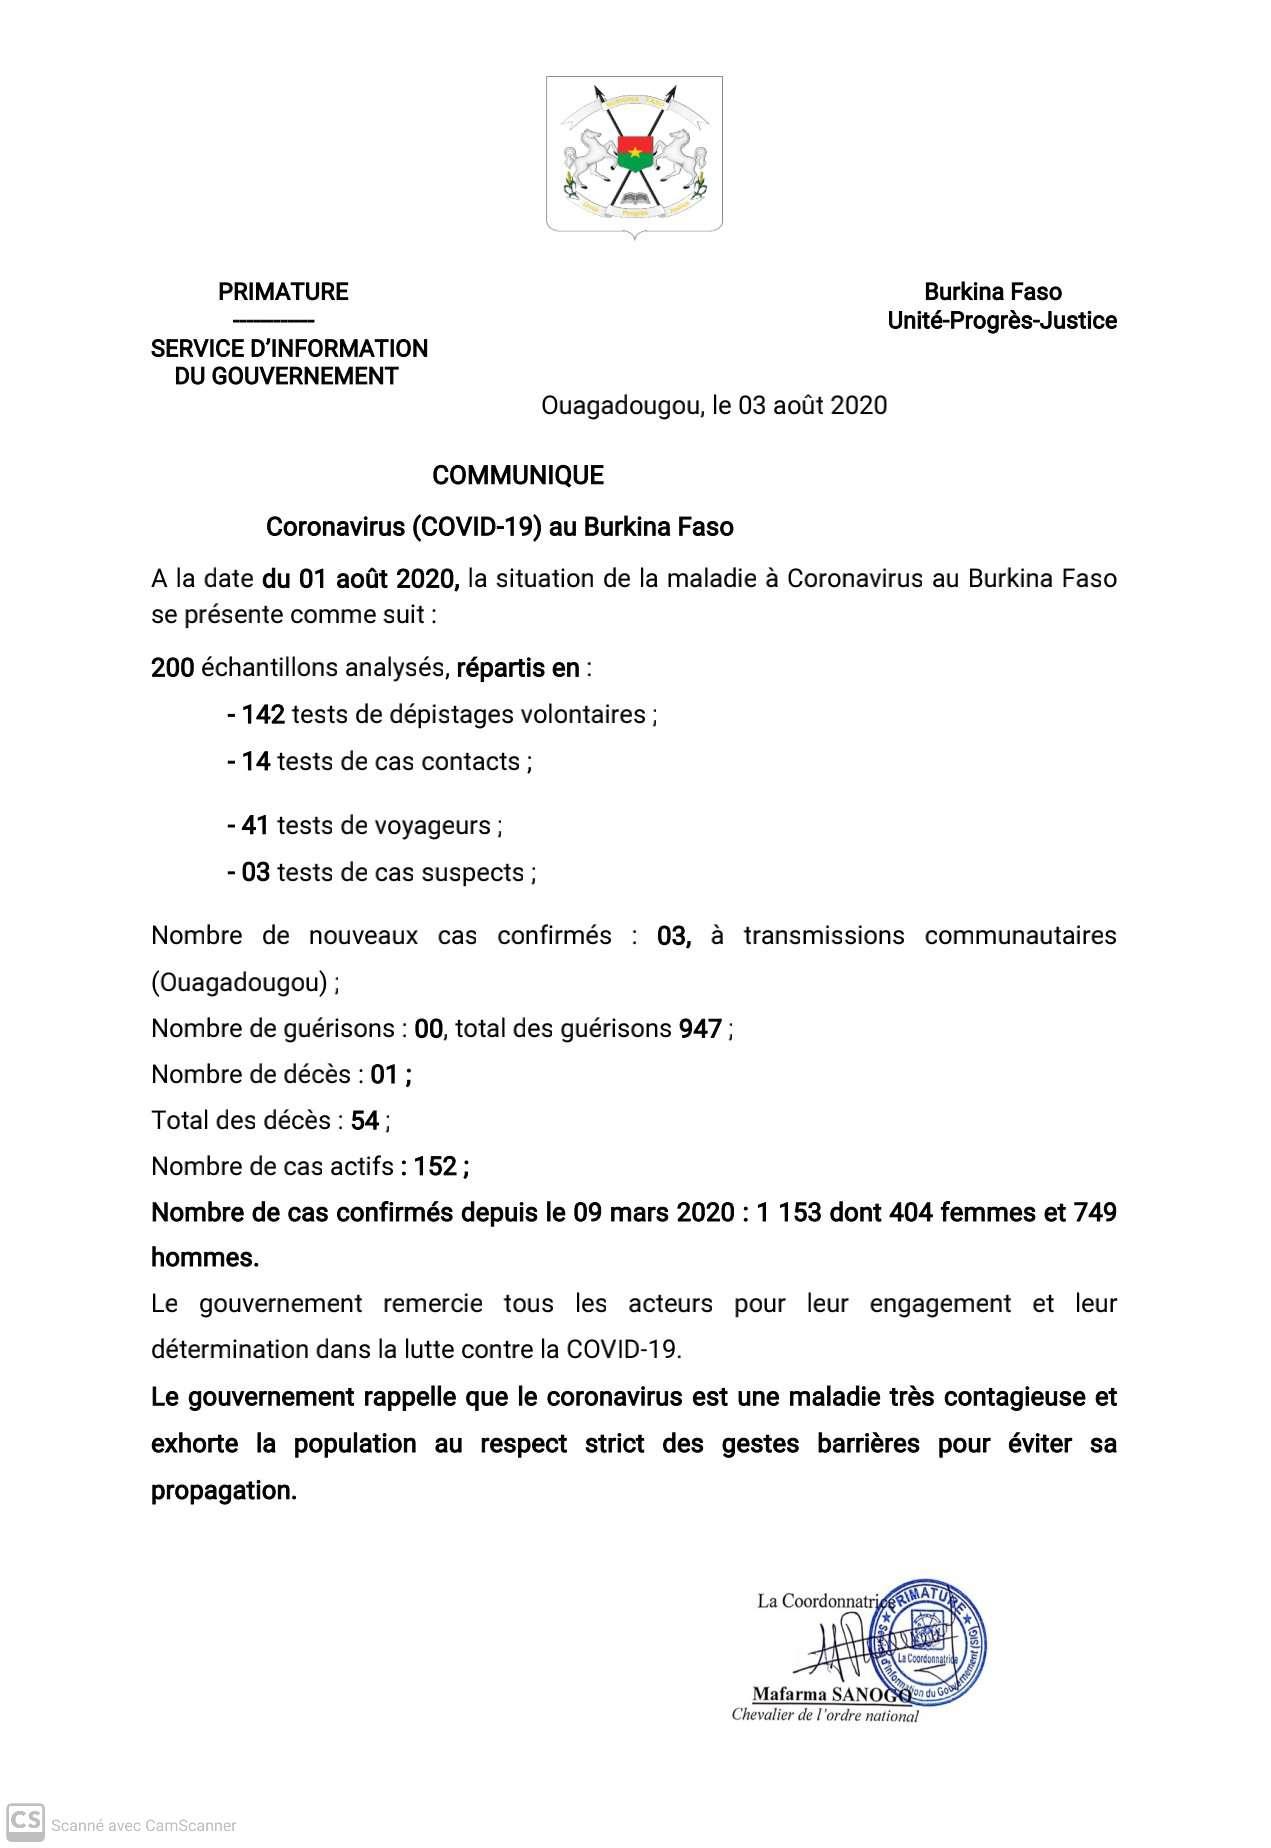 https://www.sig.gov.bf/fileadmin/user_upload/Communique___point__Covid-19_Burkina_Faso_01_aout_2020.jpg